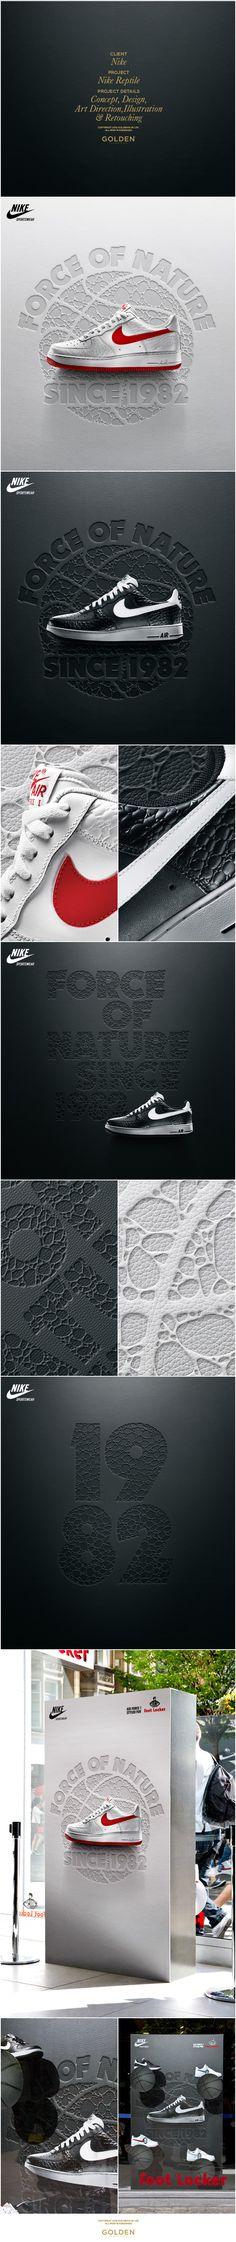 Nike Reptile on Behance